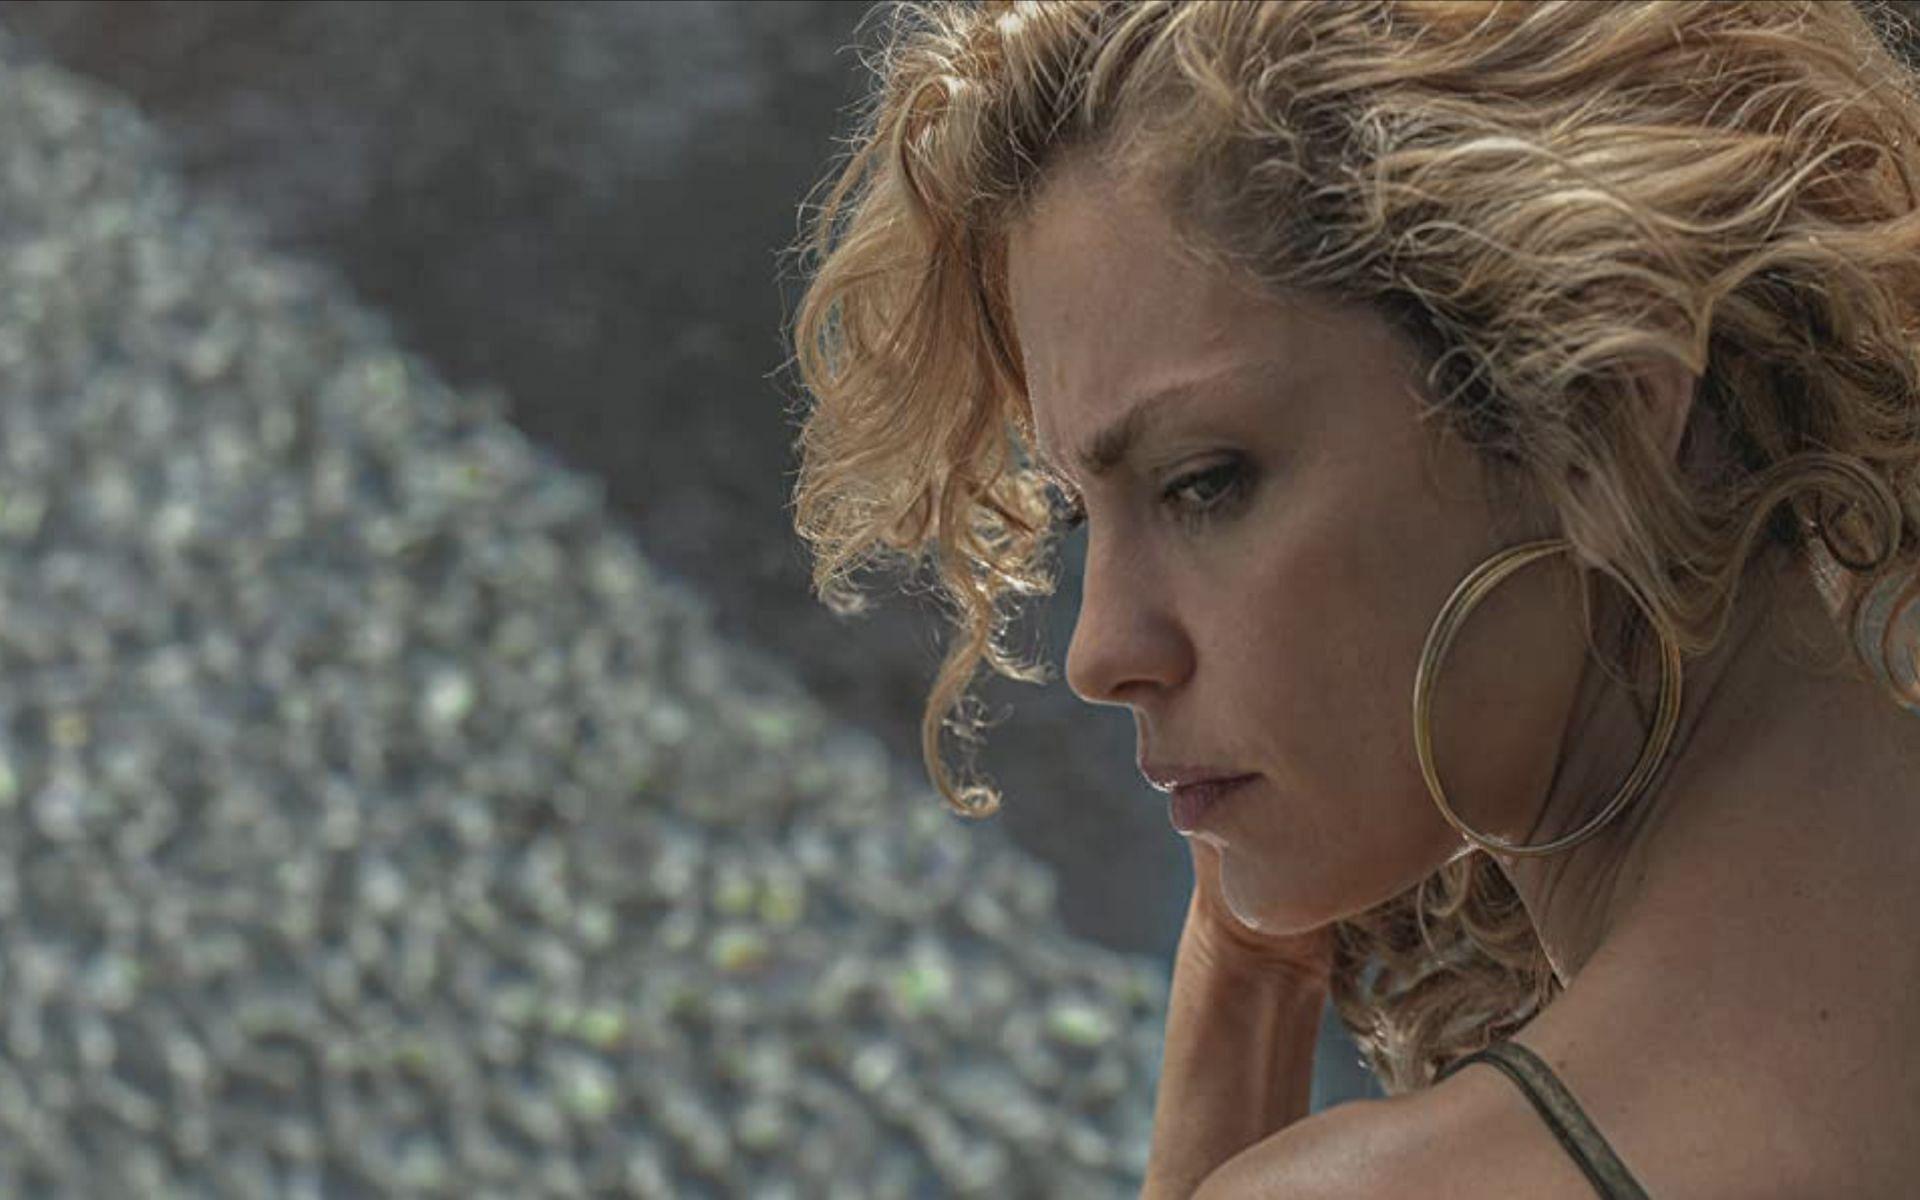 Still from Netflix's Fever Dream starring Dolores Fonzi (Image via IMDb)